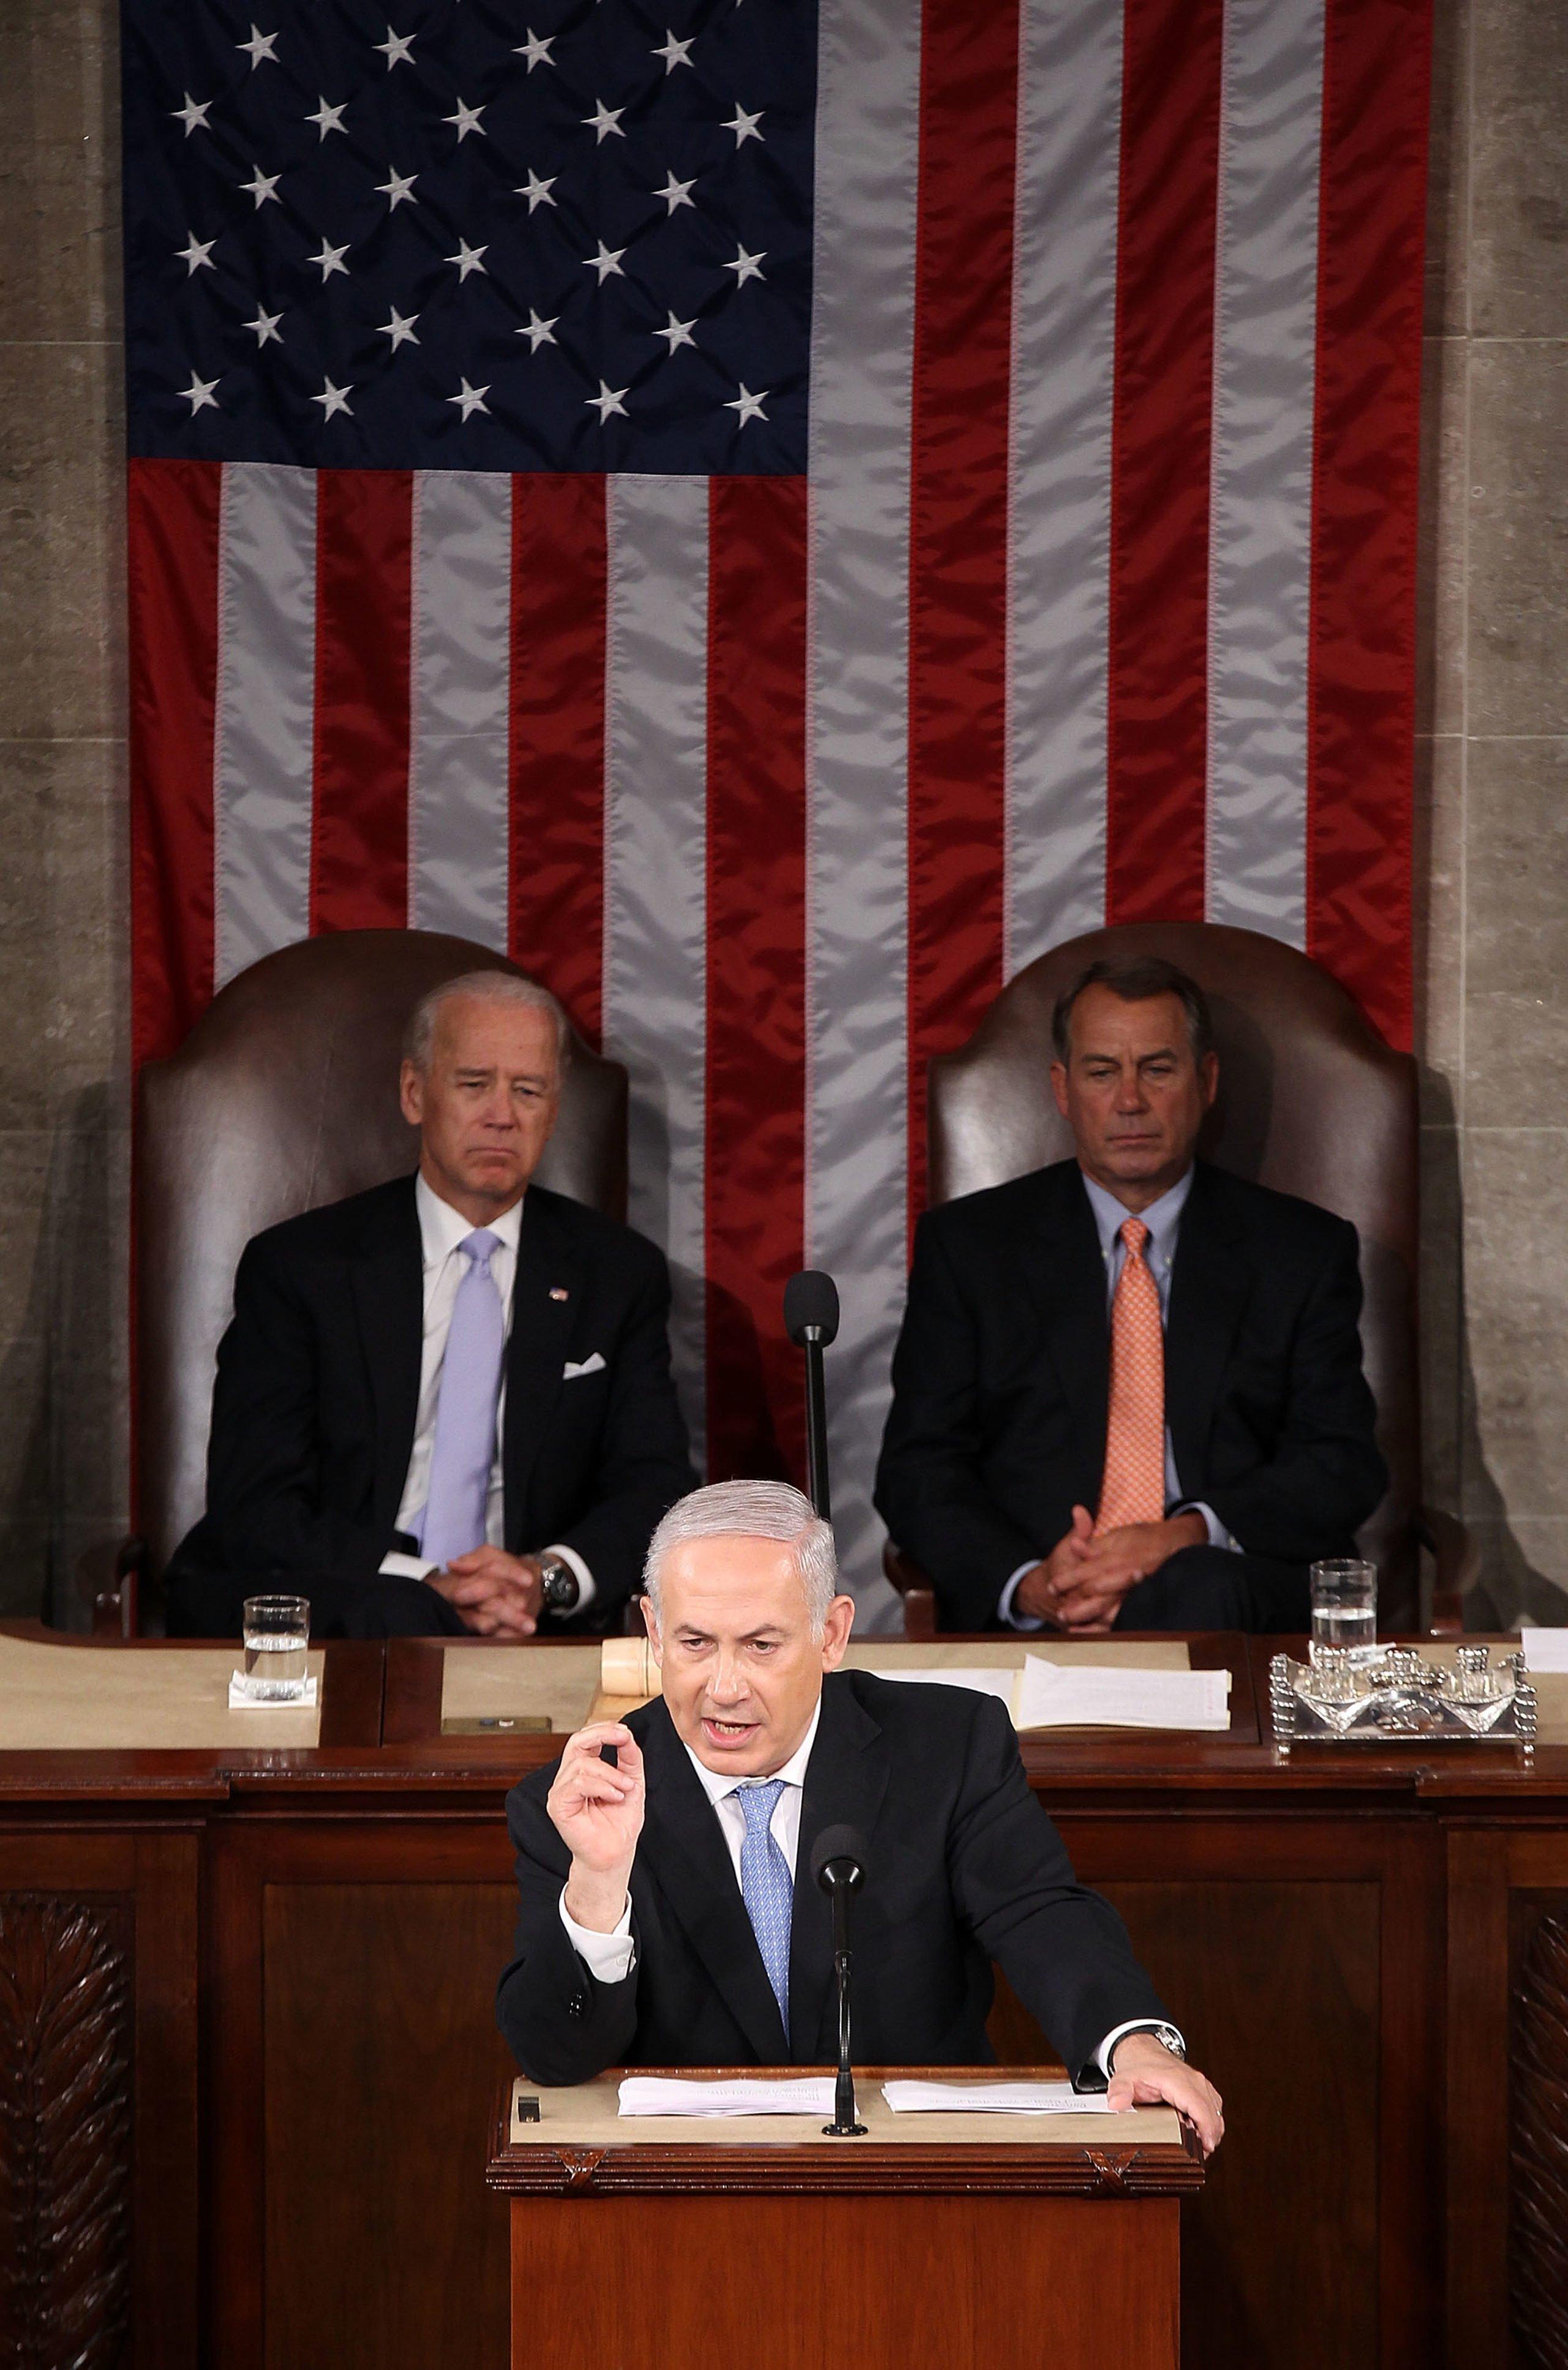 Israeli Prime Minister Benjamin Netanyahu Addresses U.S. Congress